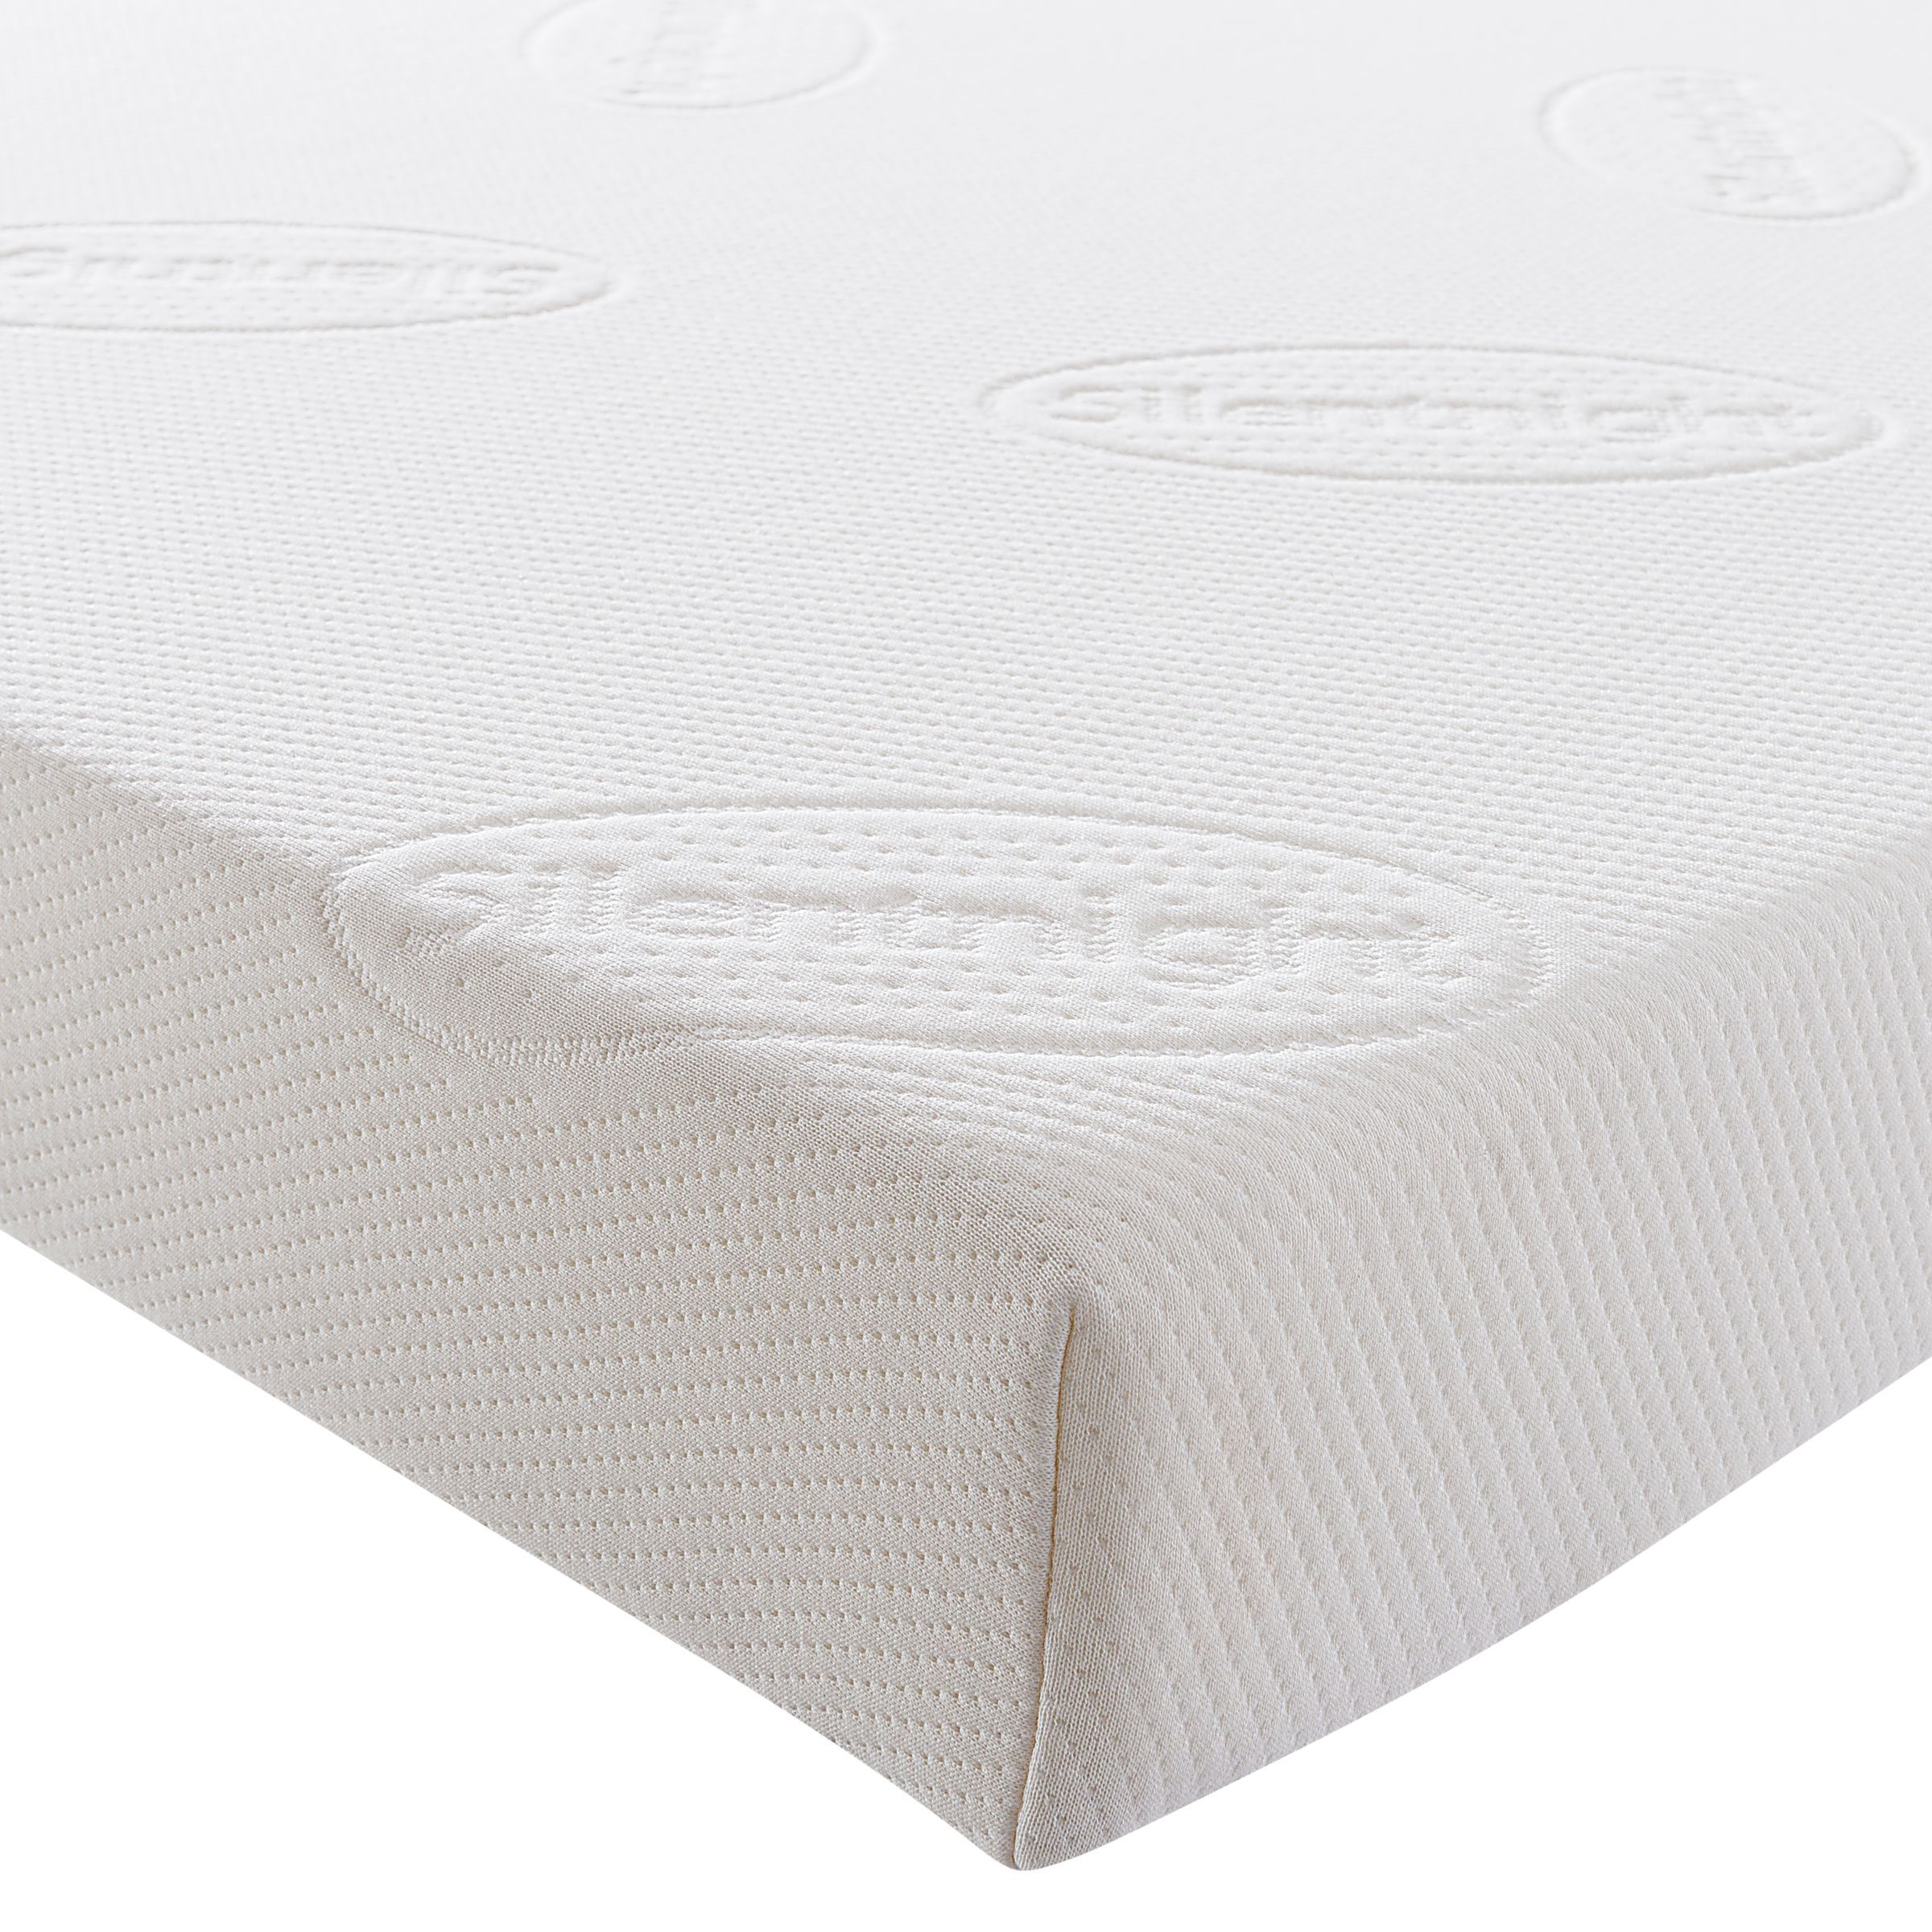 Silentnight Rolled Foam Junior Bunk Bed Mattress Medium Single